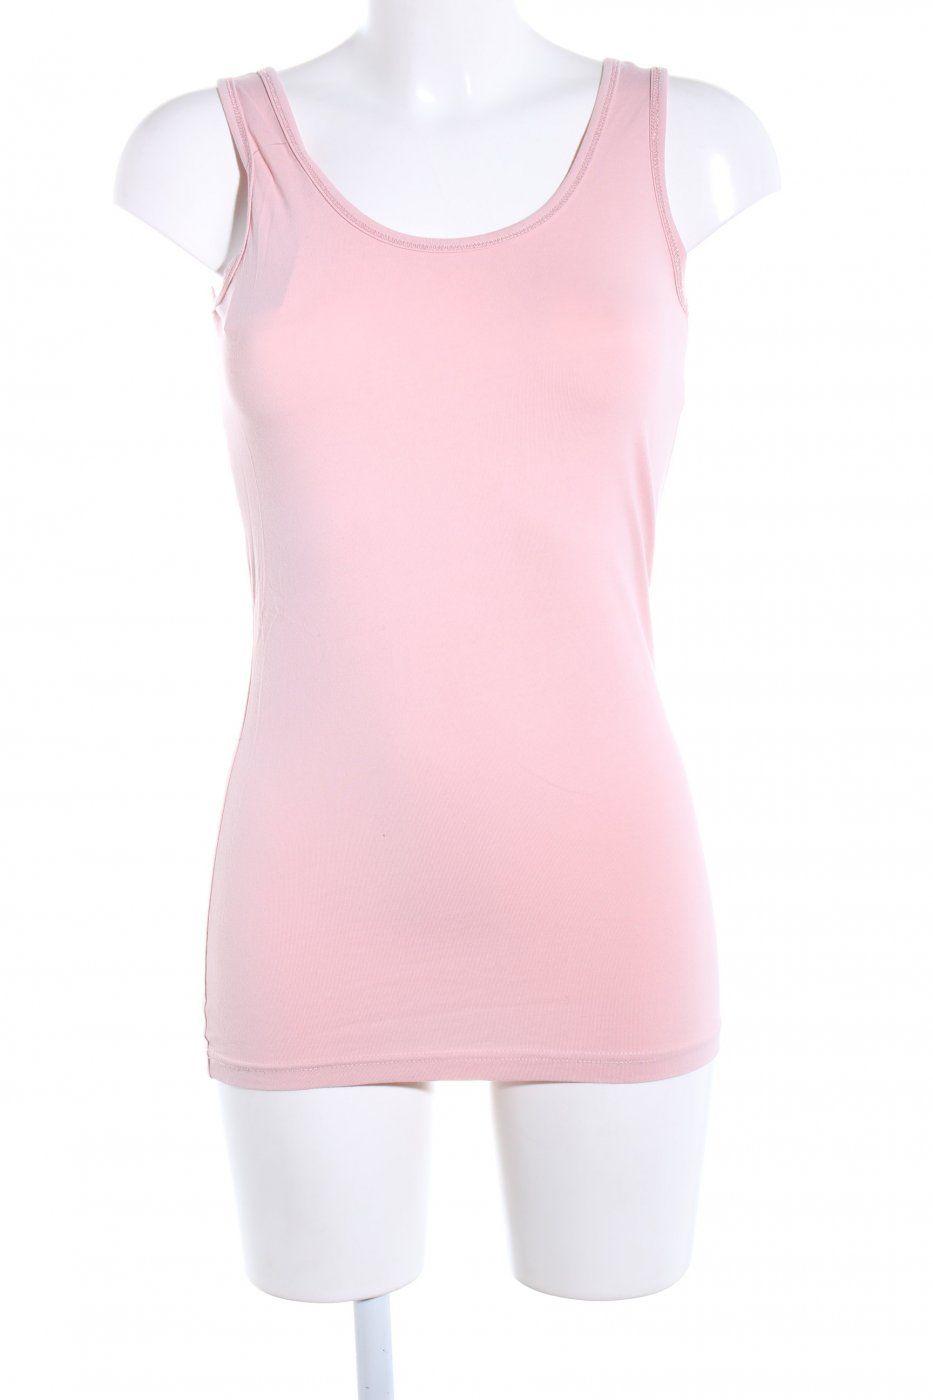 active Tanktop pink Casual-Look | Mädchenflohmarkt